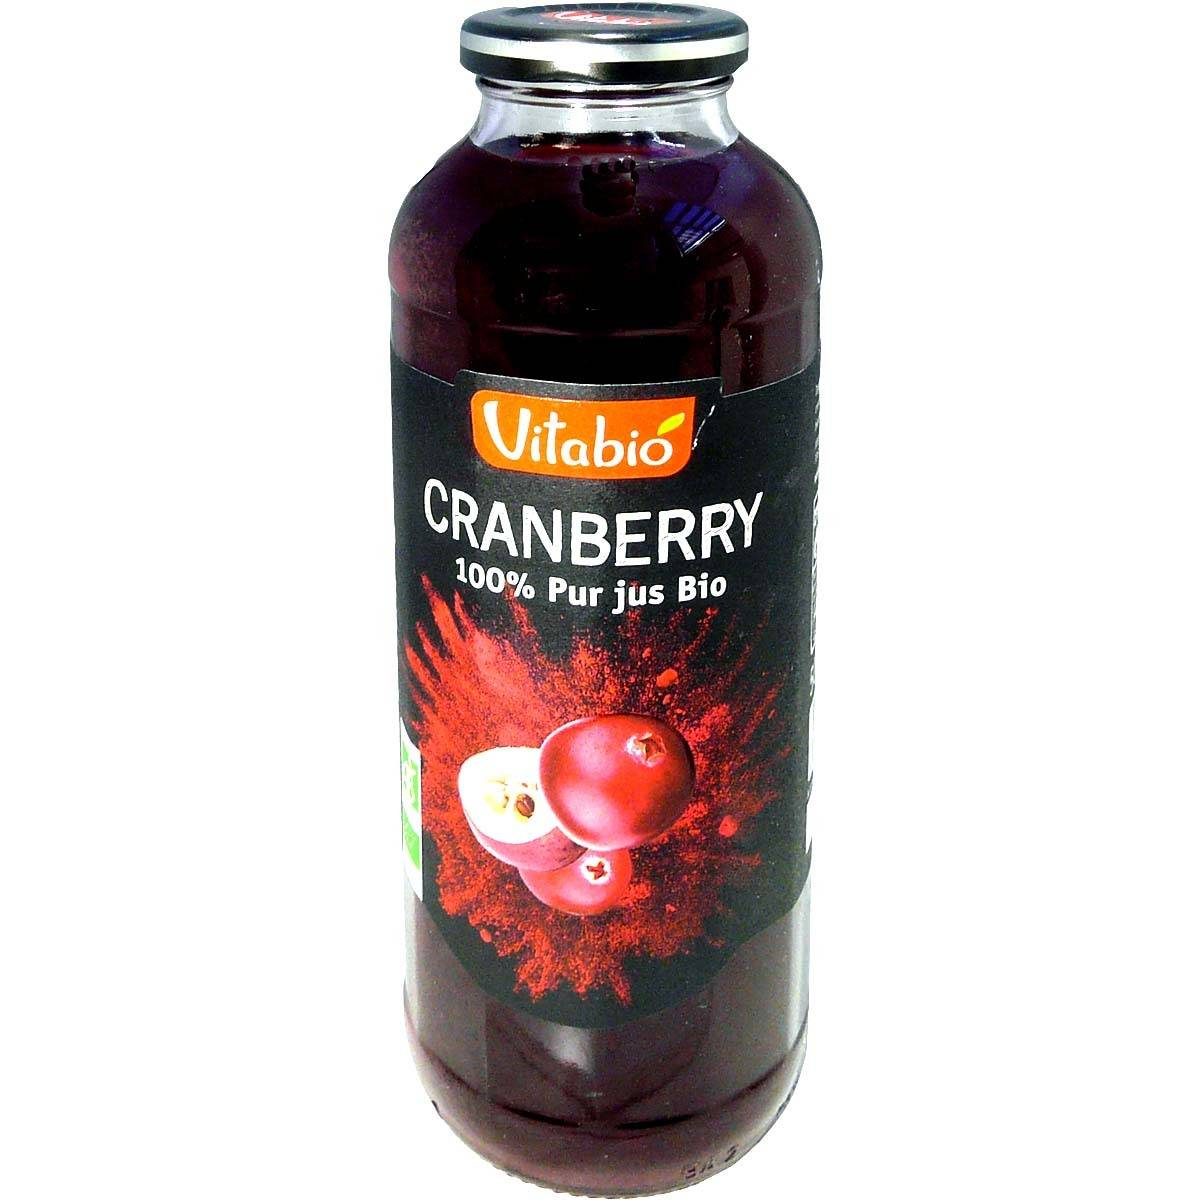 Vitabio jus de cranberry bio 50 cl